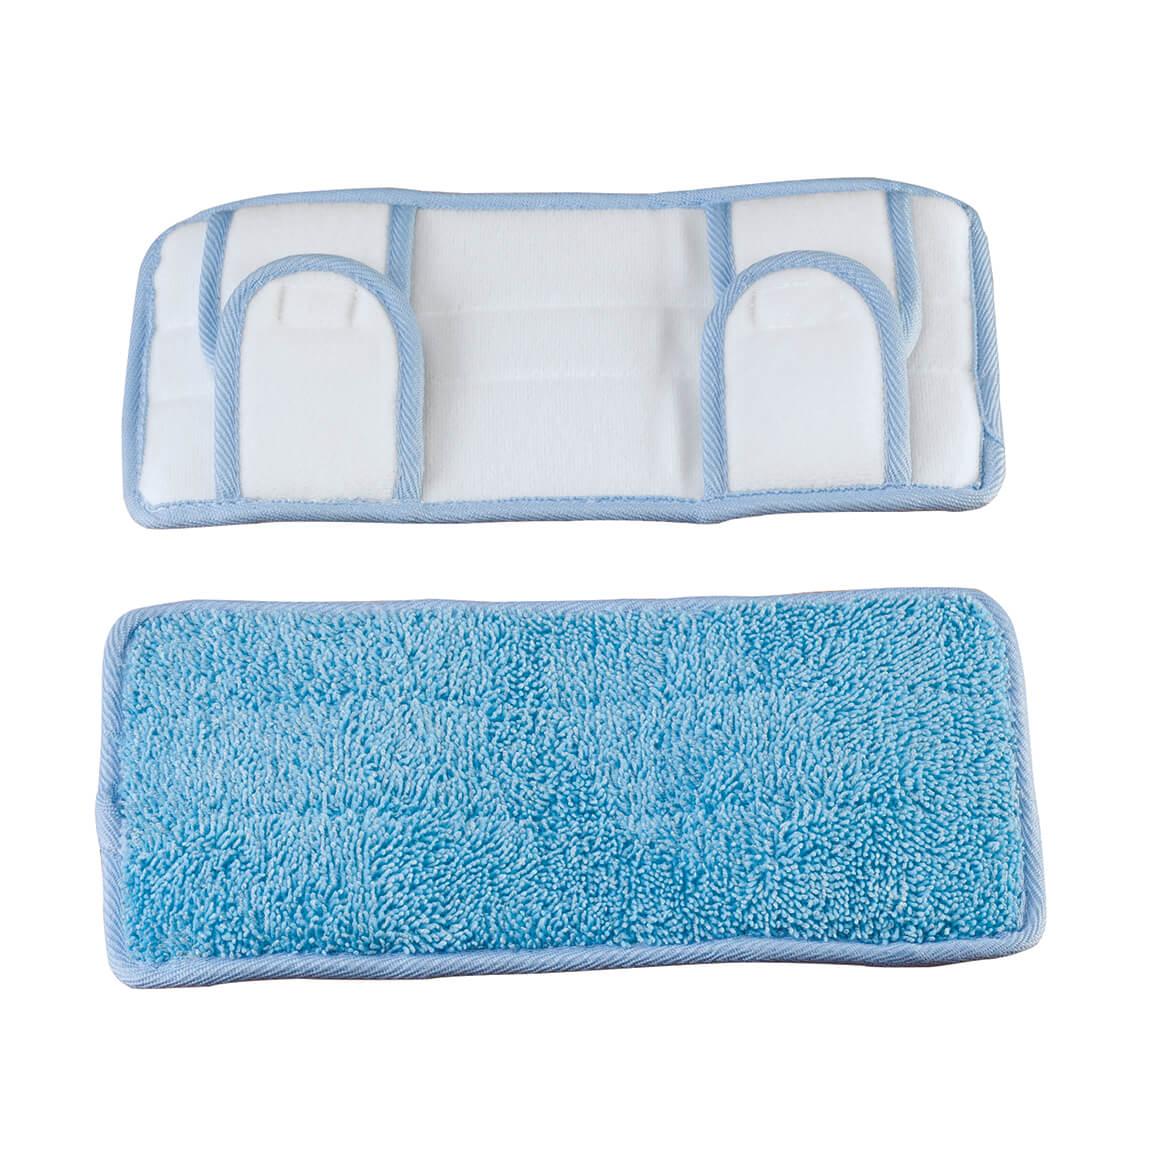 Money-Saving Mop Pad 2-Pack-361730